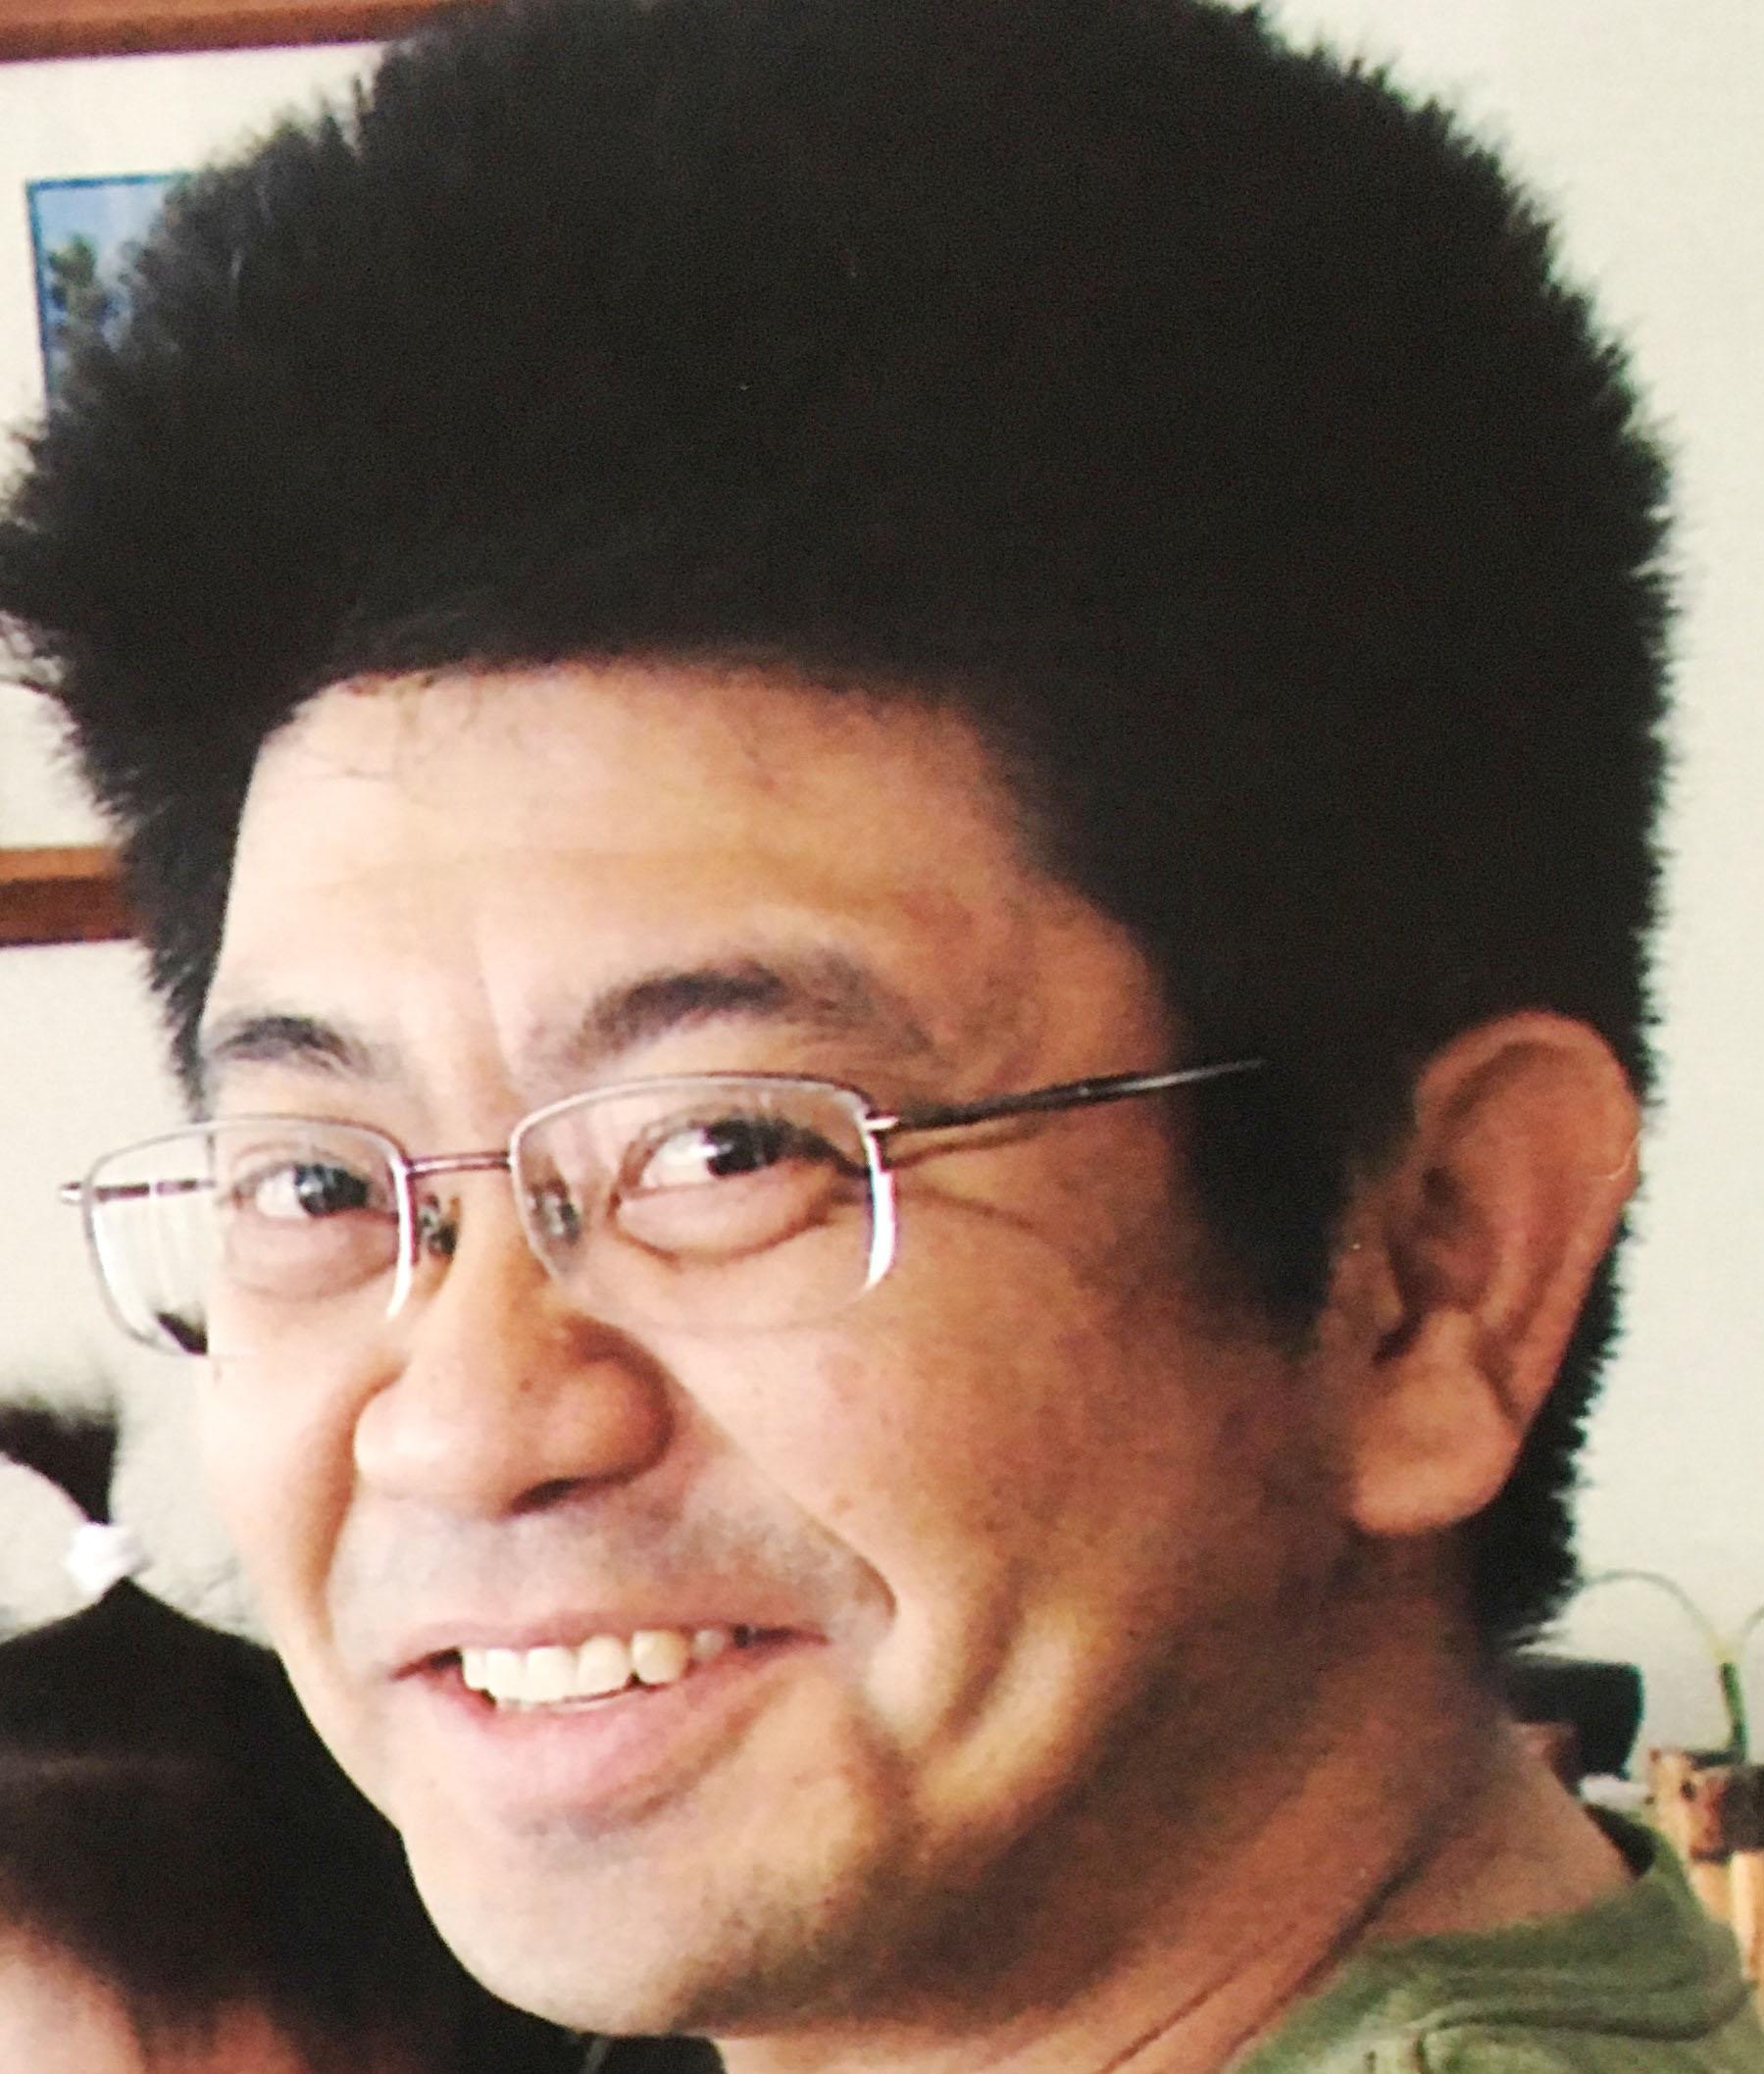 Spencer Sadahumi Ueda